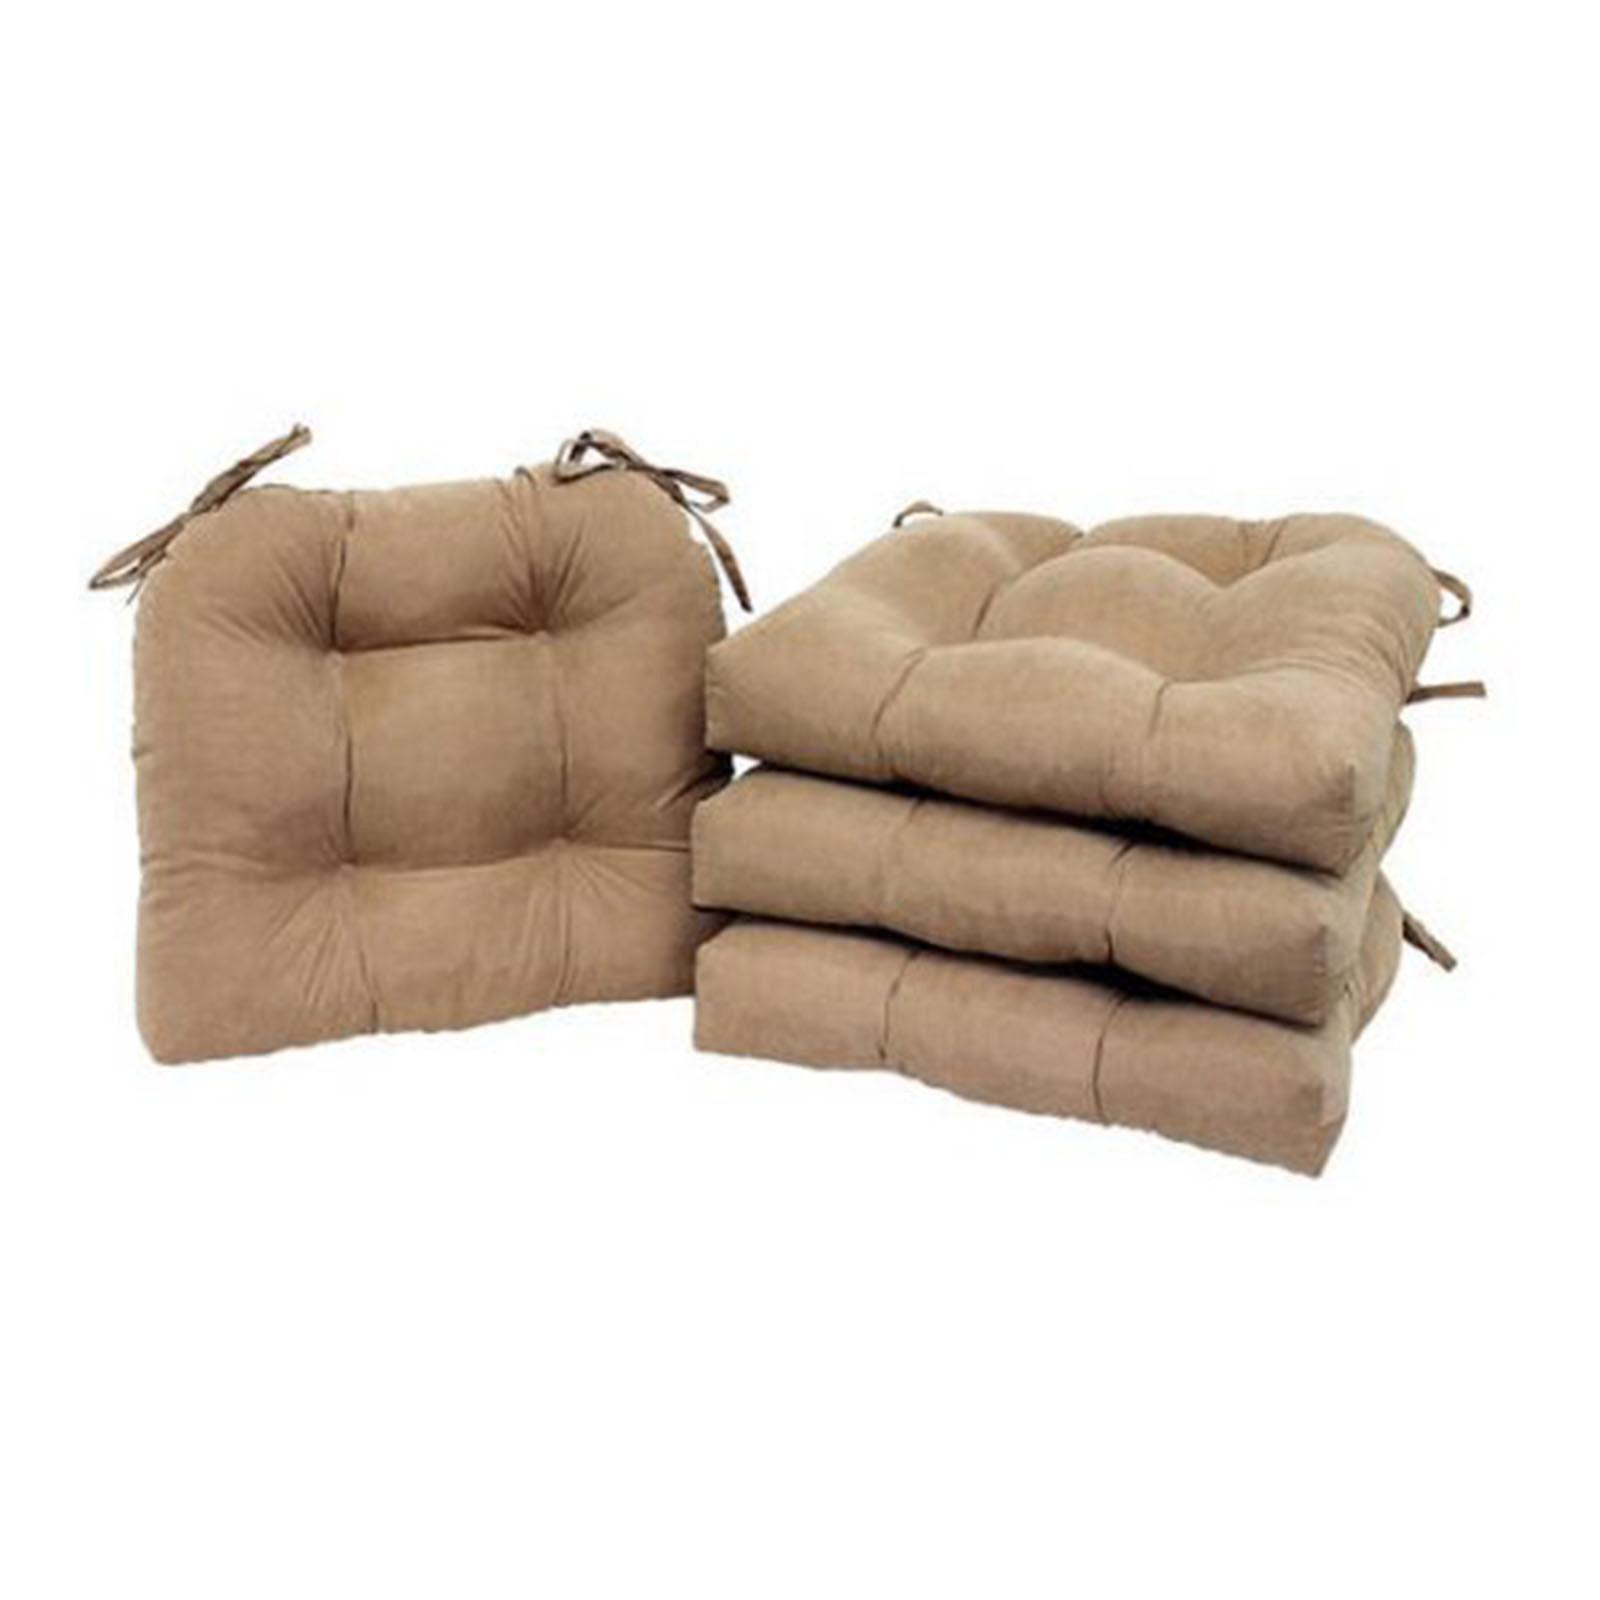 Patio Cushion Set 4 Pad Garden Furniture Soft